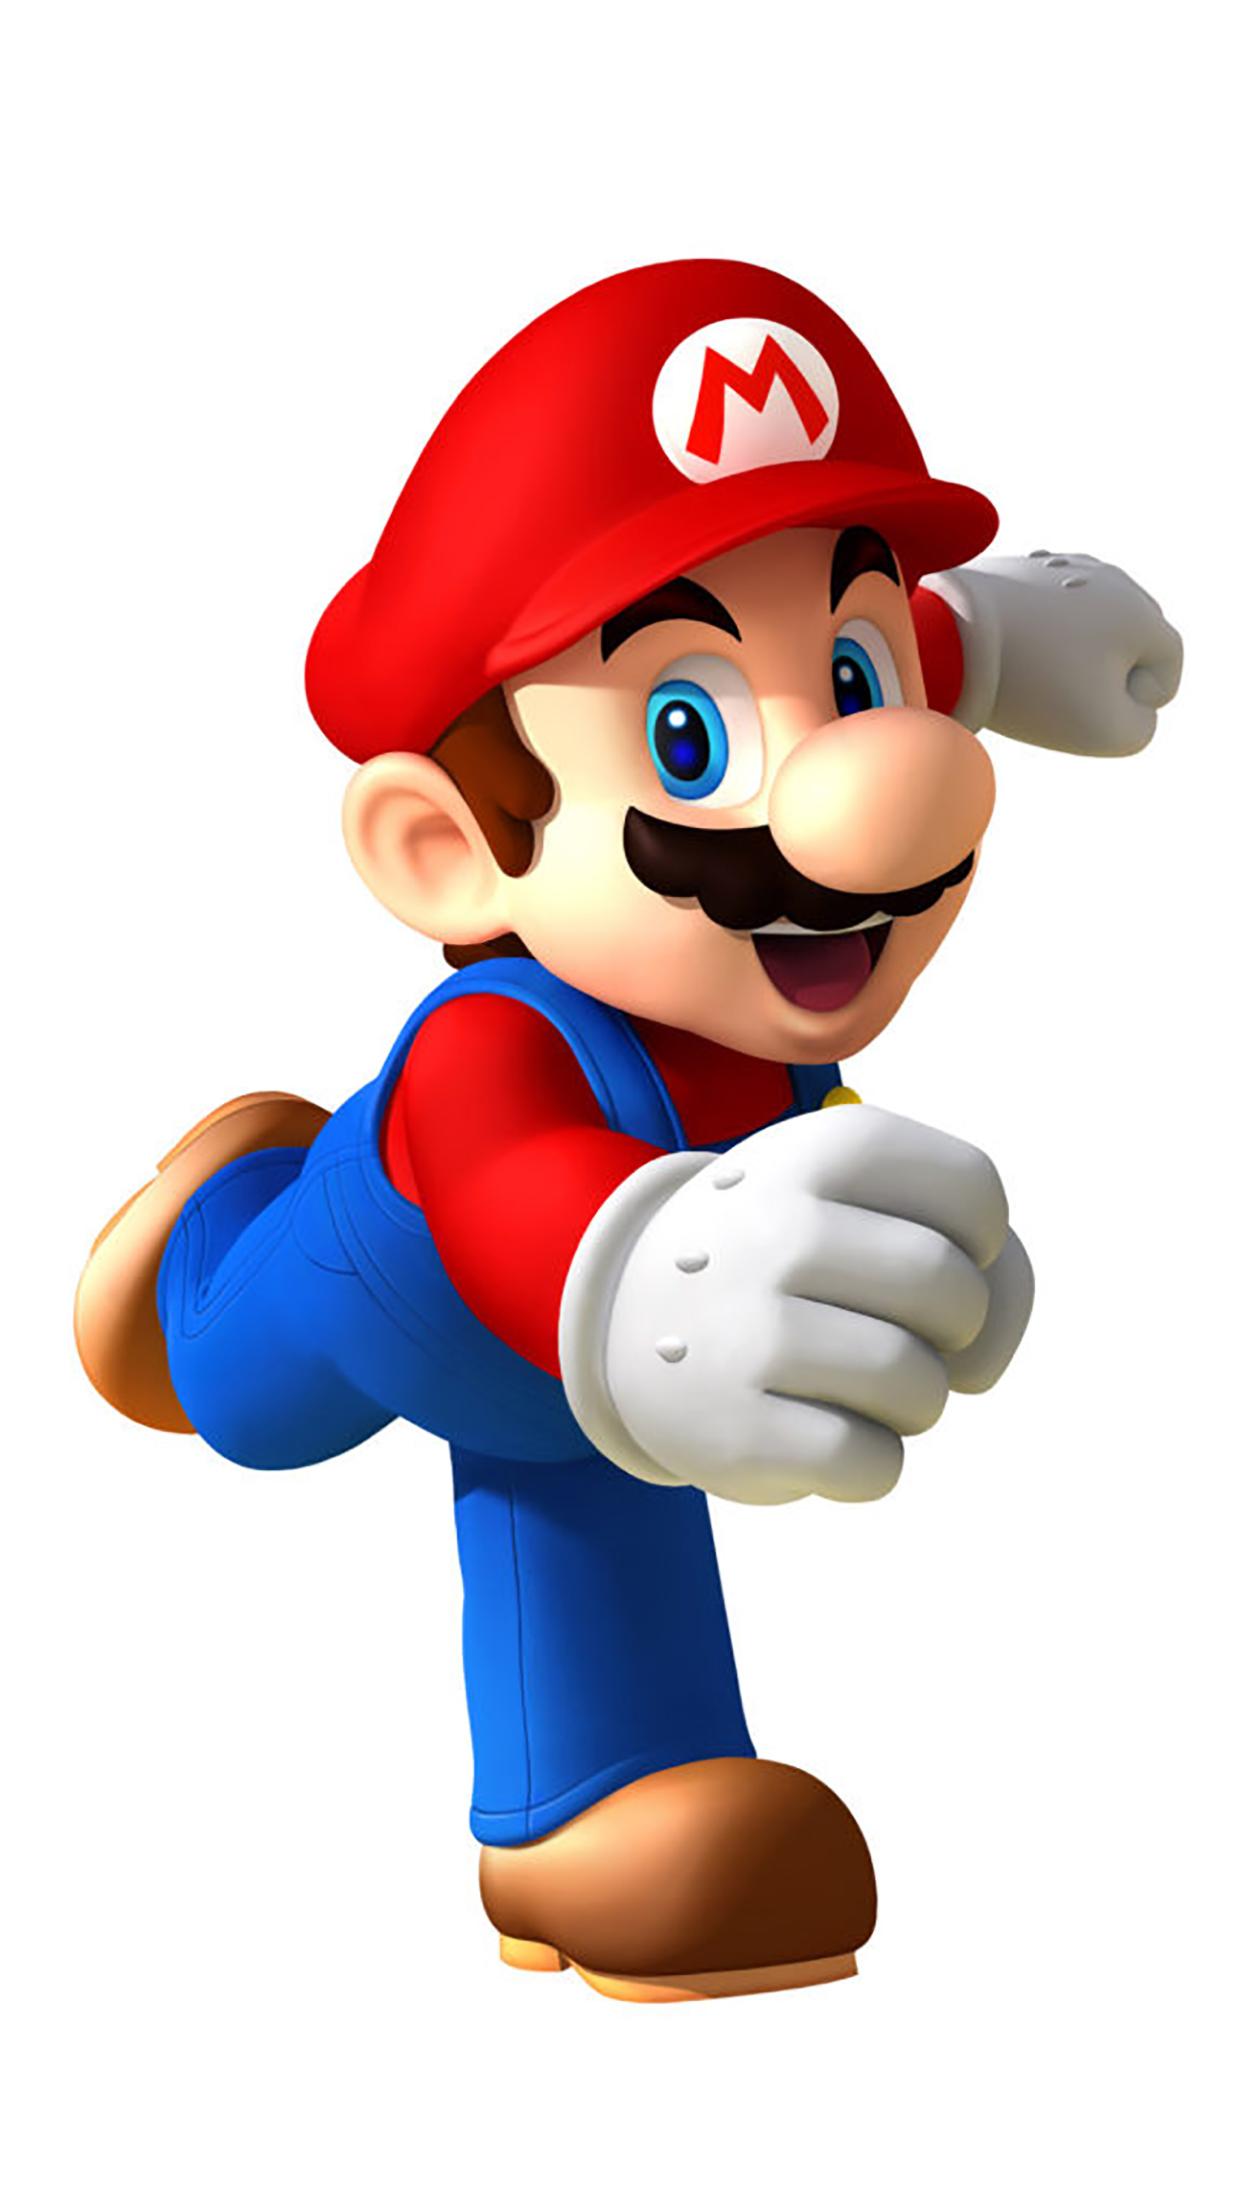 Super Mario Running 3Wallpapers iPhone Parallax Les 3Wallpapers iPhone du jour (18/12/2016)